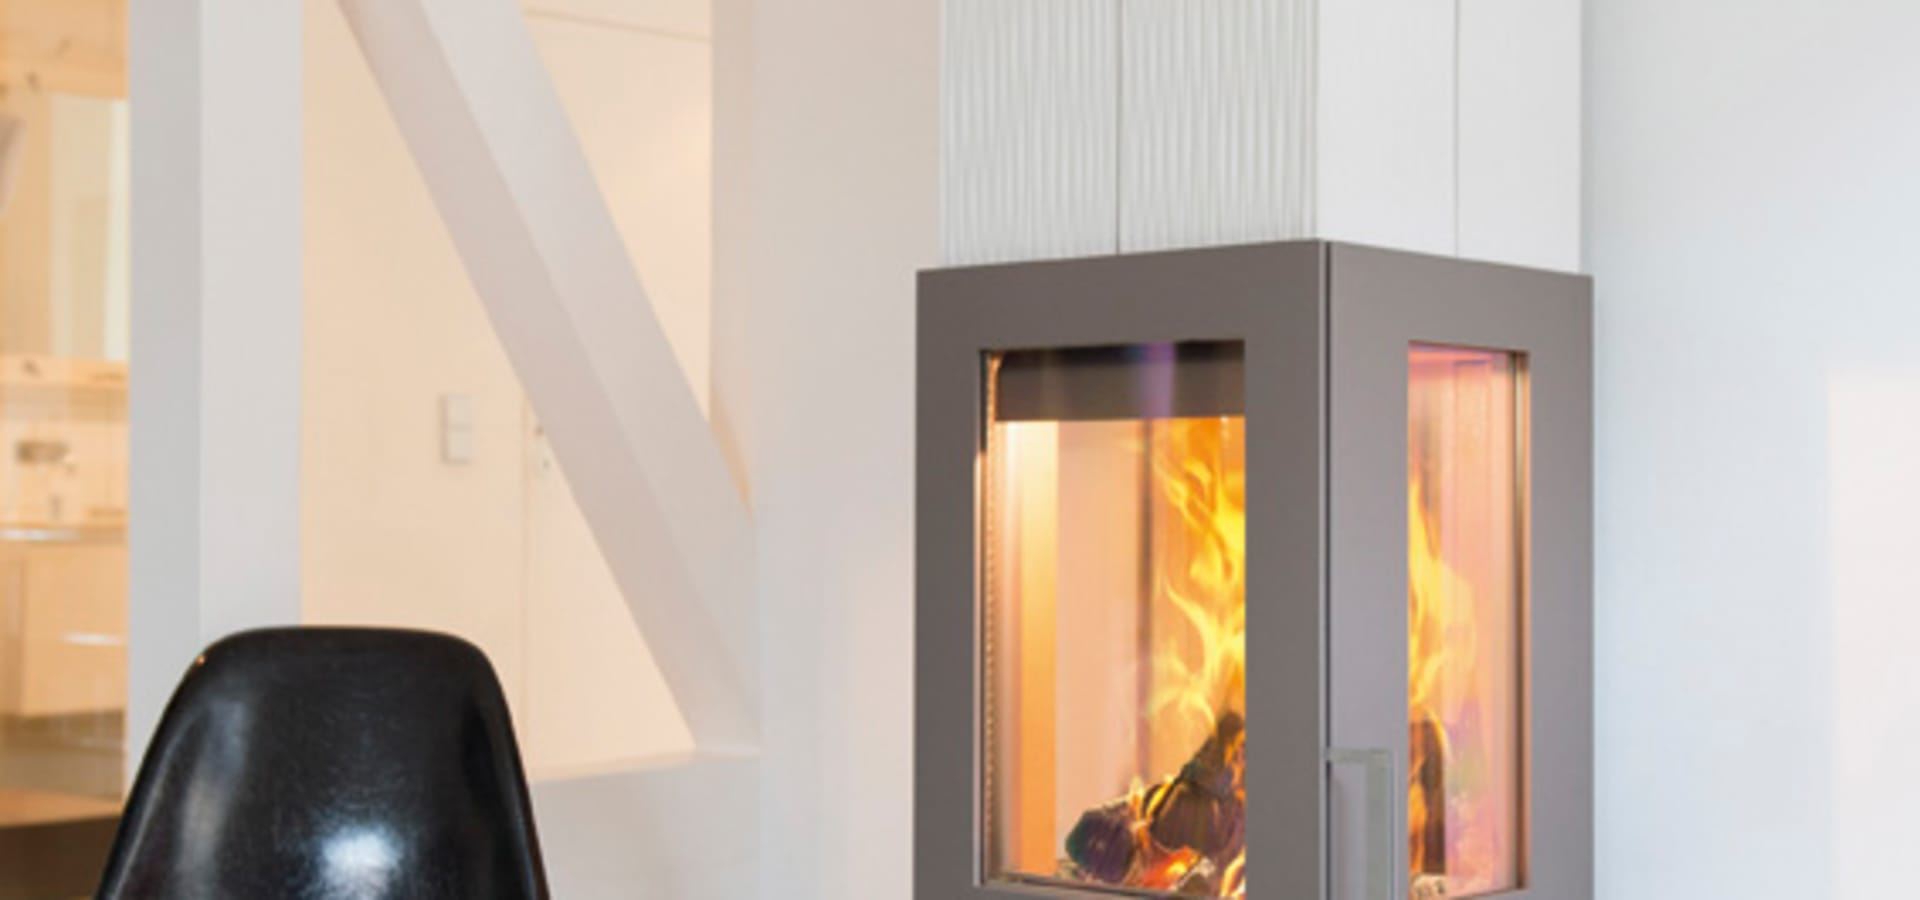 gold award winner kaminofen asmara von hase kaminofenbau. Black Bedroom Furniture Sets. Home Design Ideas